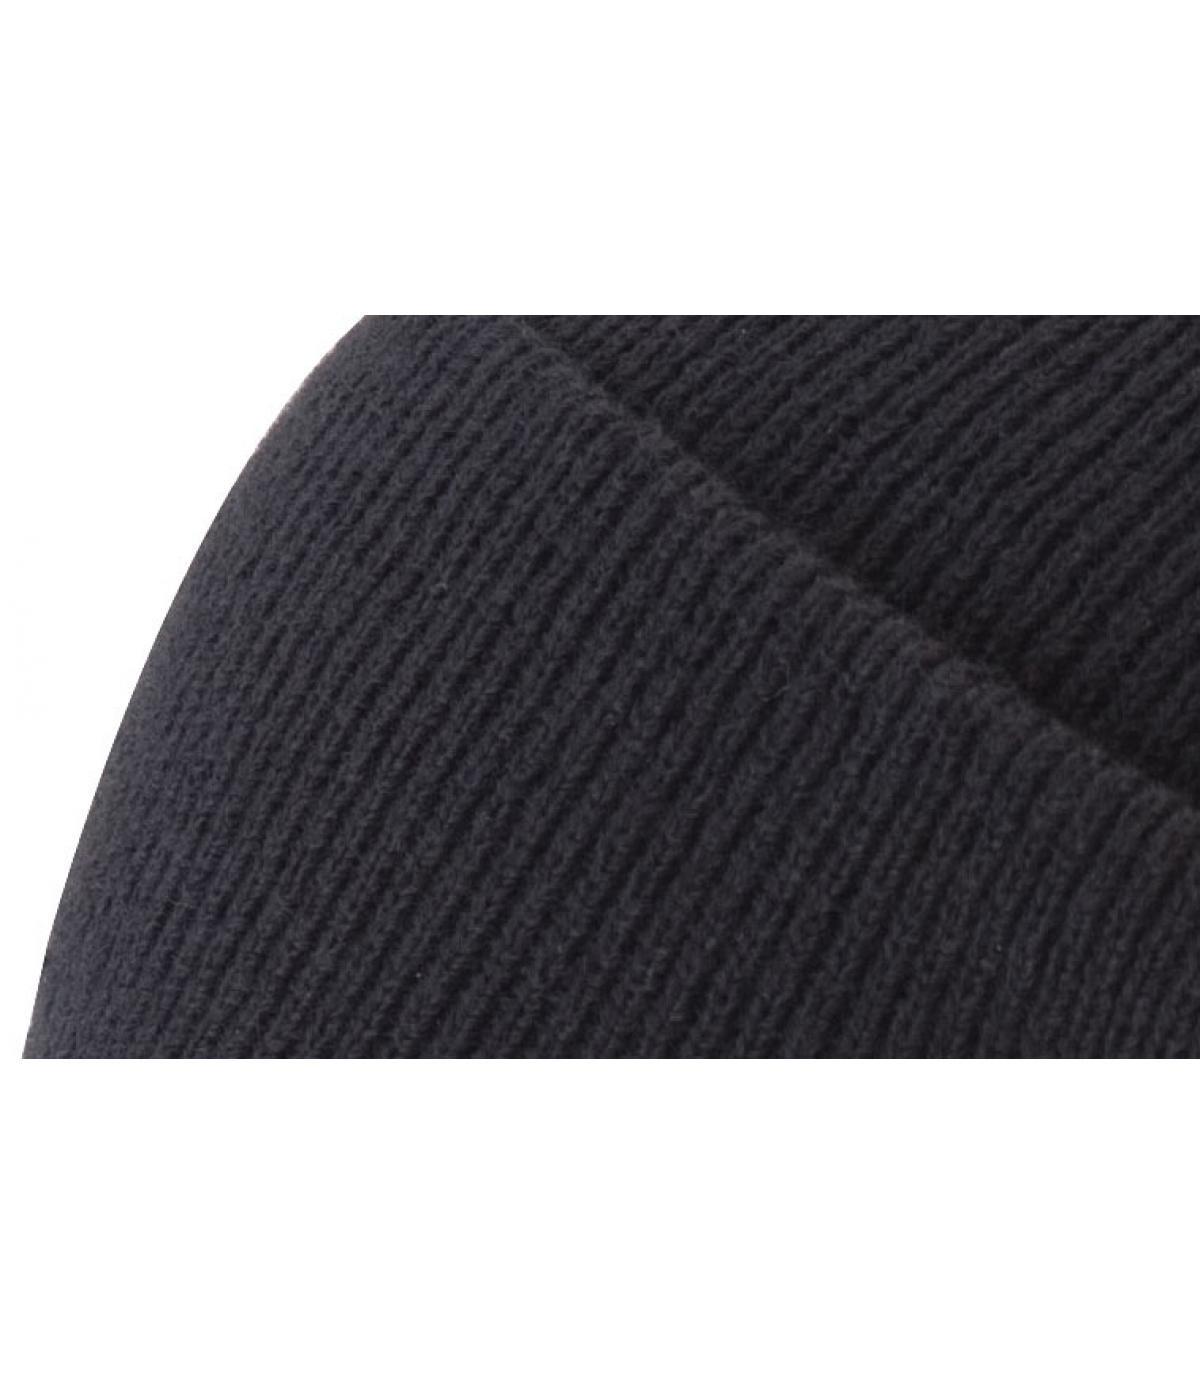 uniform solid noir coal